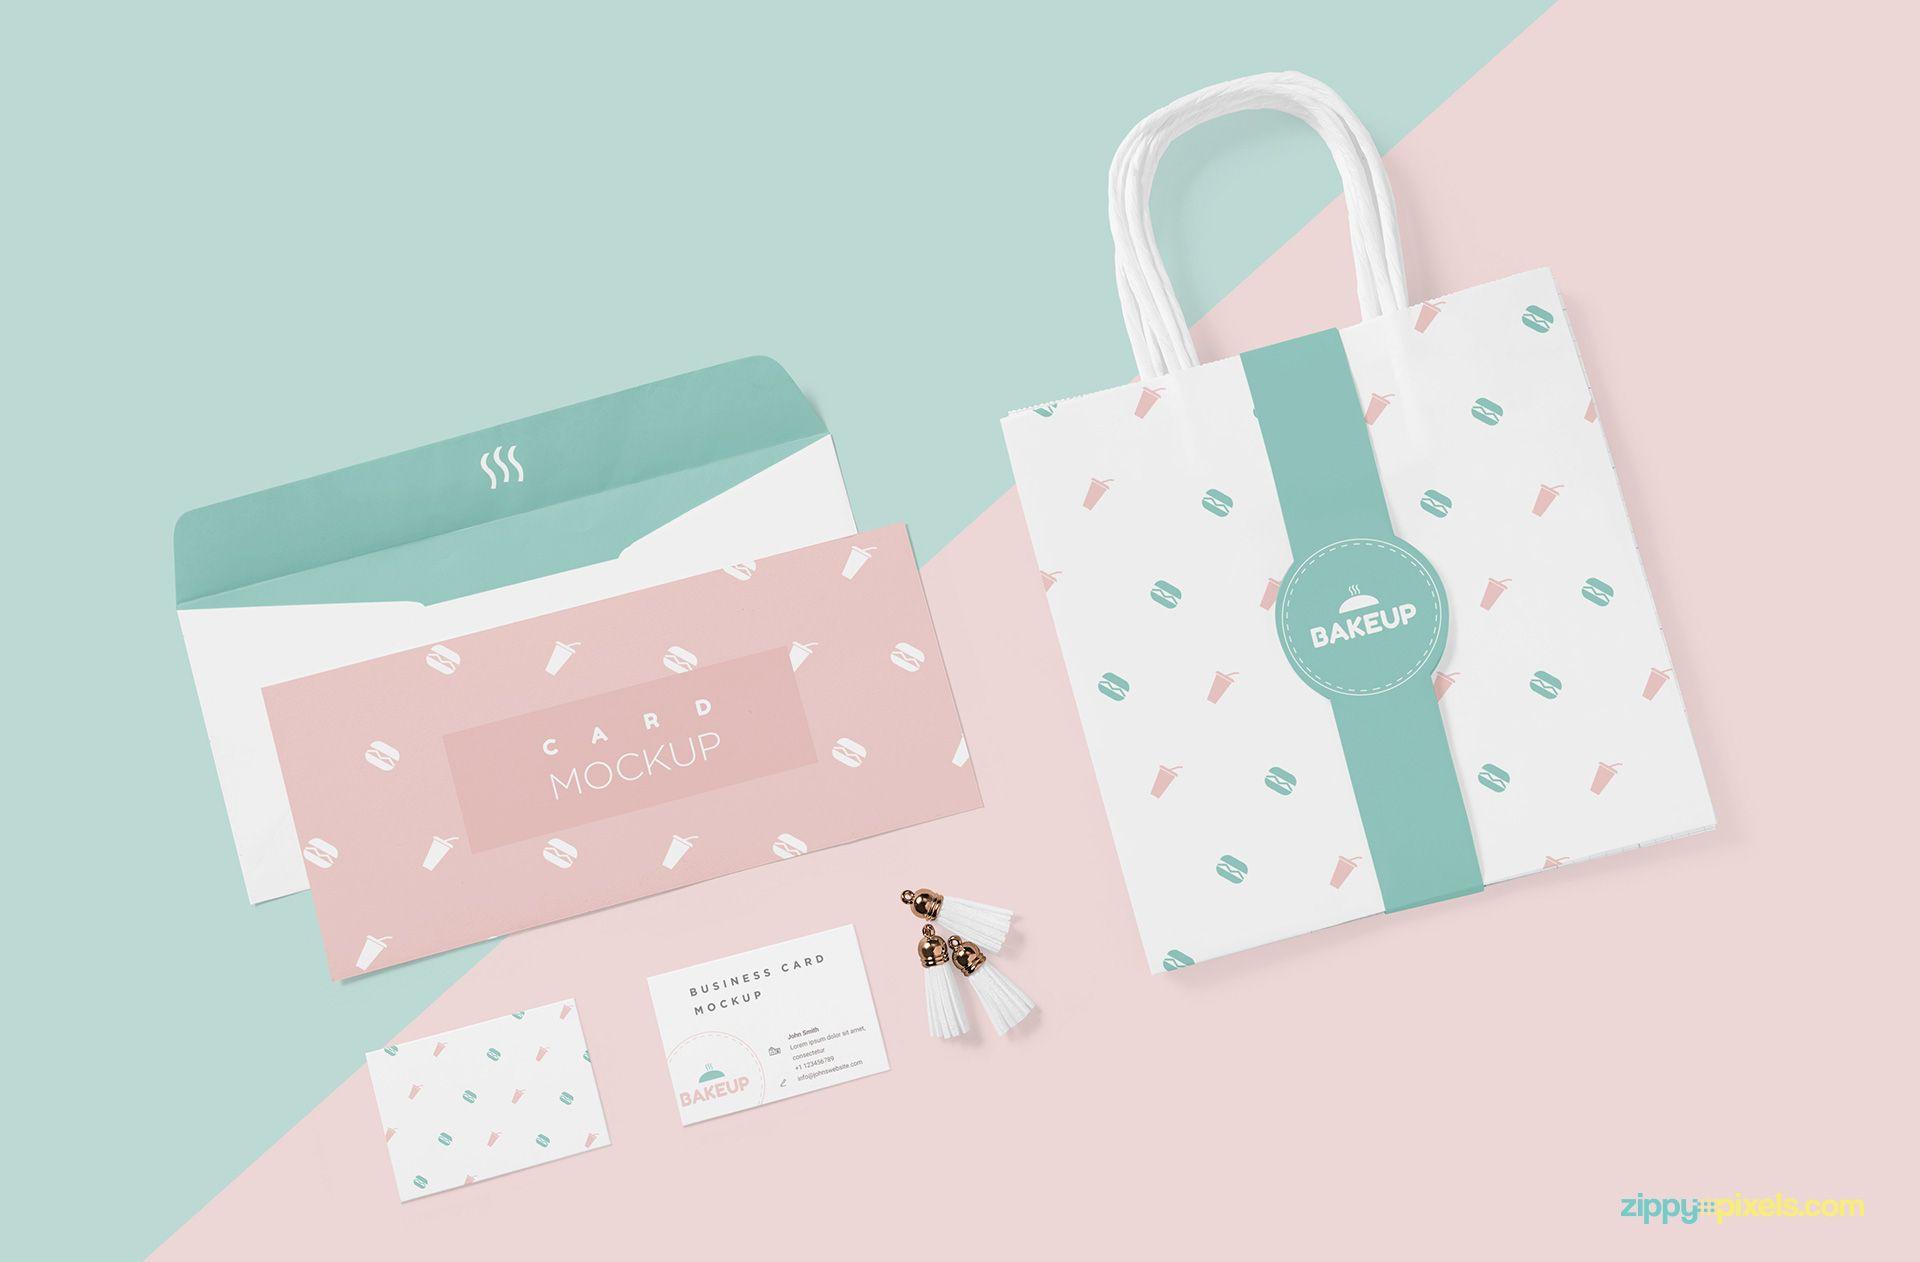 Download Free Tote Bag Mockup Psd Zippypixels Bag Mockup Best Tote Bags Tote Bag